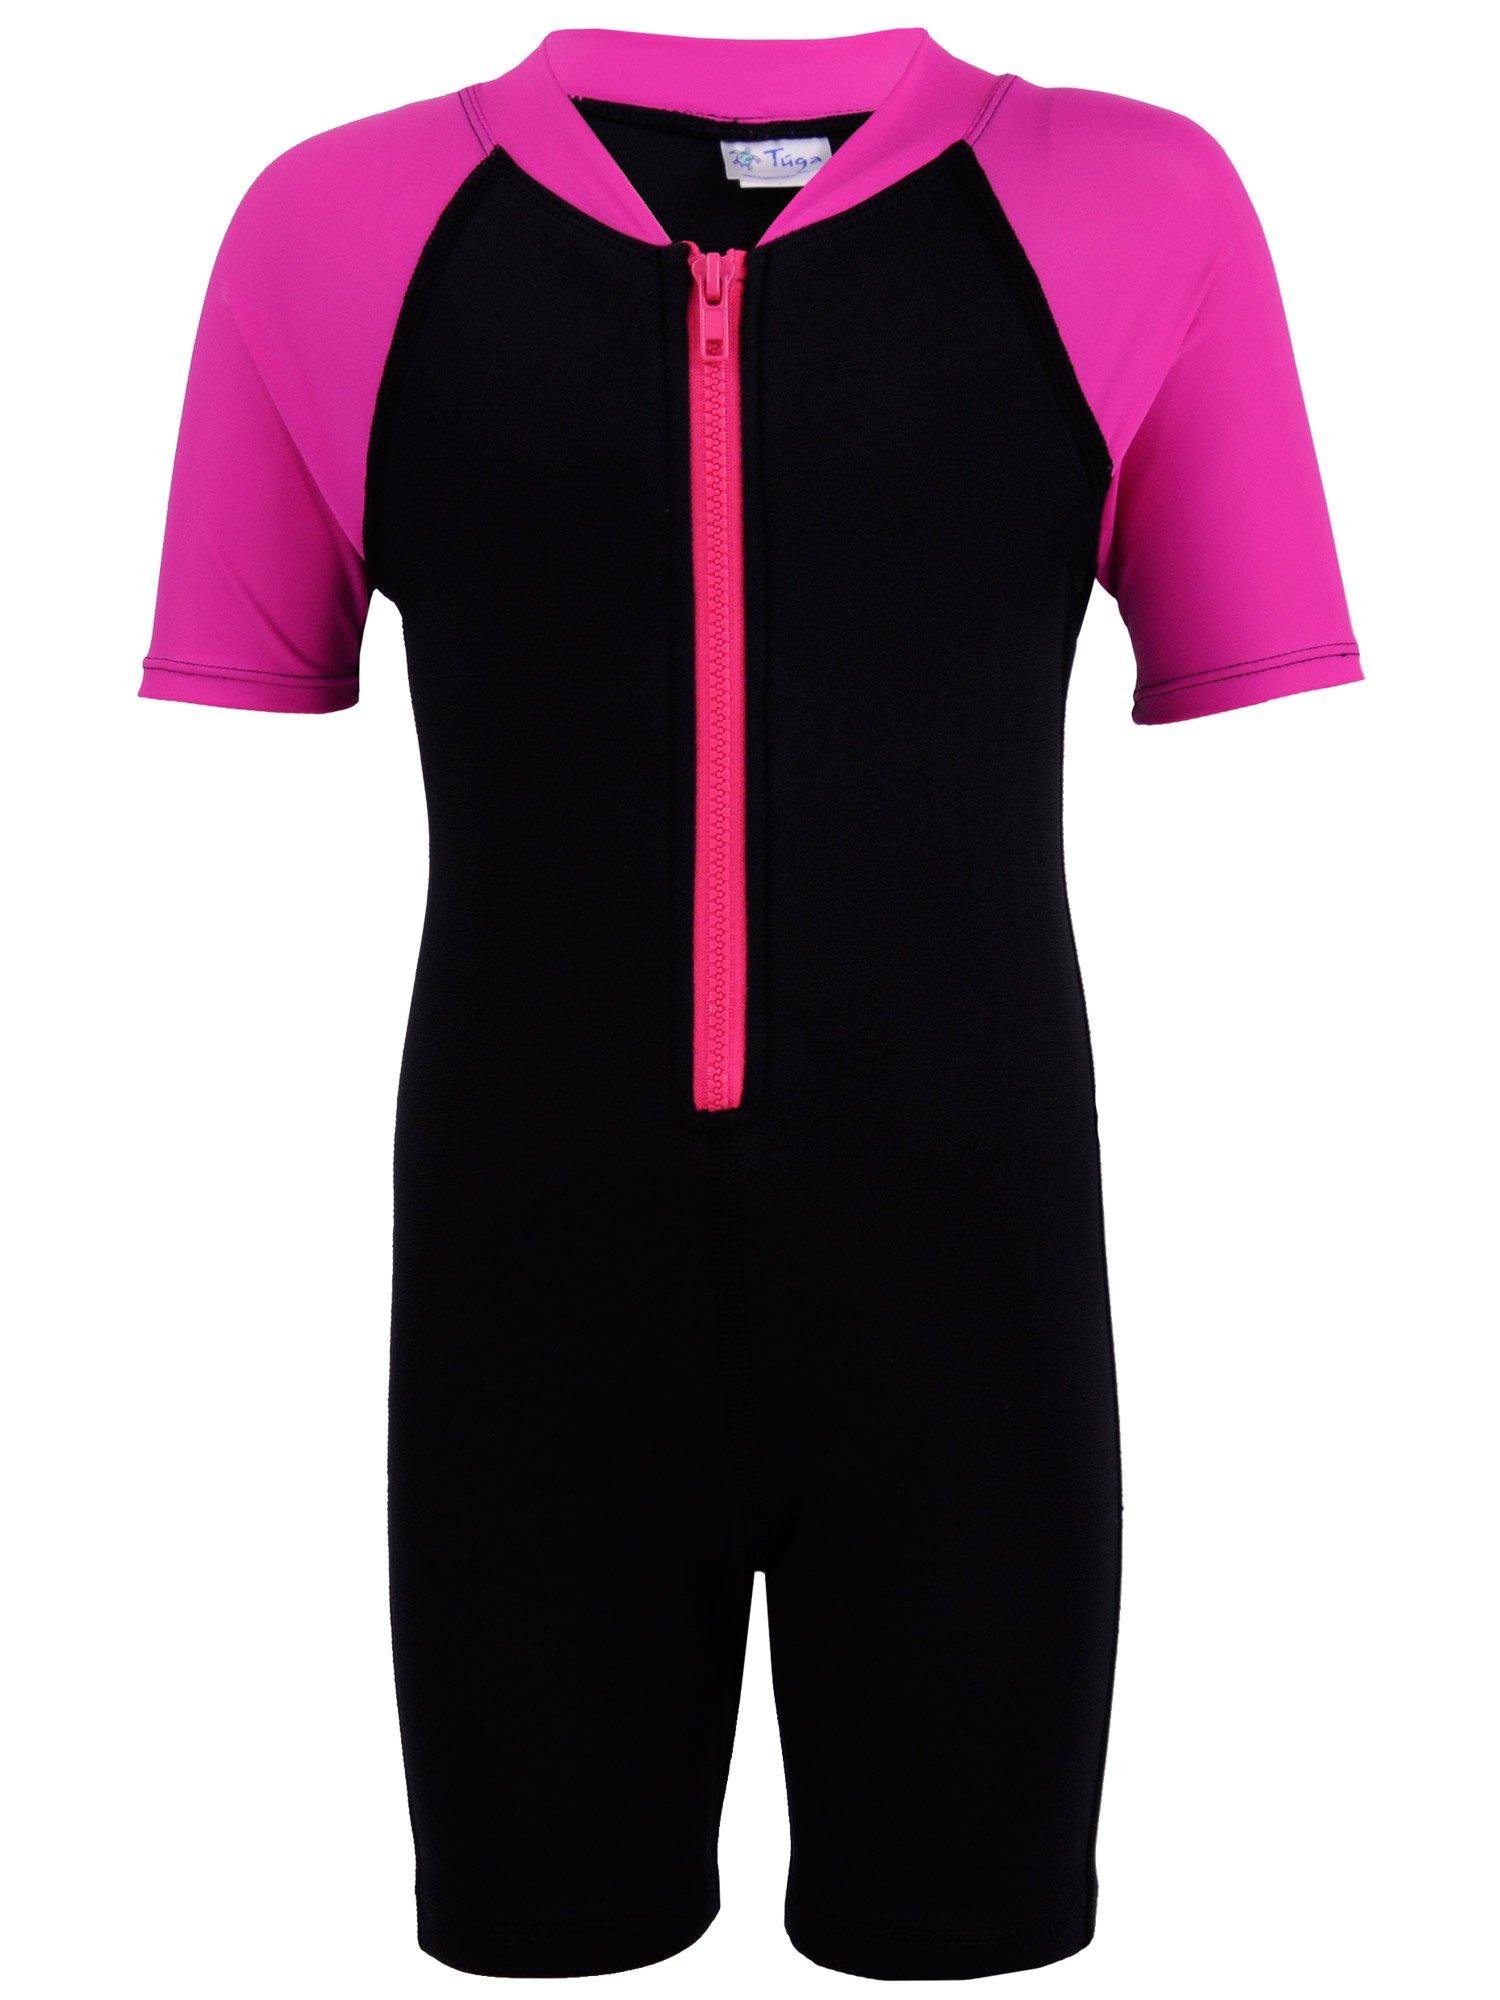 Tuga Girls Shorty 1.5mm Neoprene/Spandex Wetsuit (UPF 50+), Fuchsia, 2 yrs